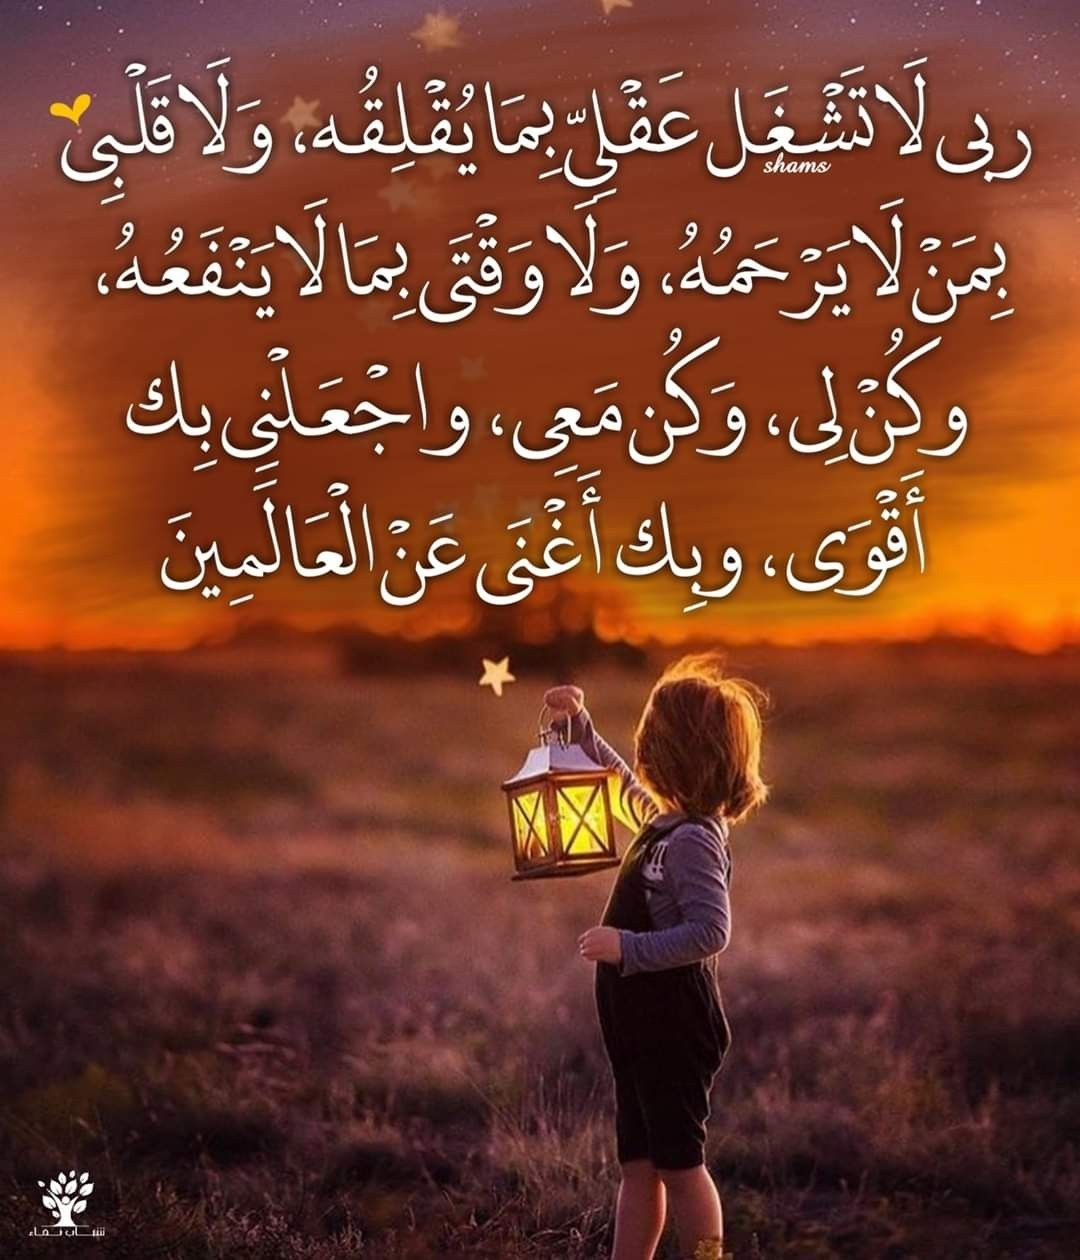 Pin By The Noble Quran On I Love Allah Quran Islam The Prophet Miracles Hadith Heaven Prophets Faith Prayer Dua حكم وعبر احاديث الله اسلام قرآن دعاء Islamic Prayer Prayers Jye